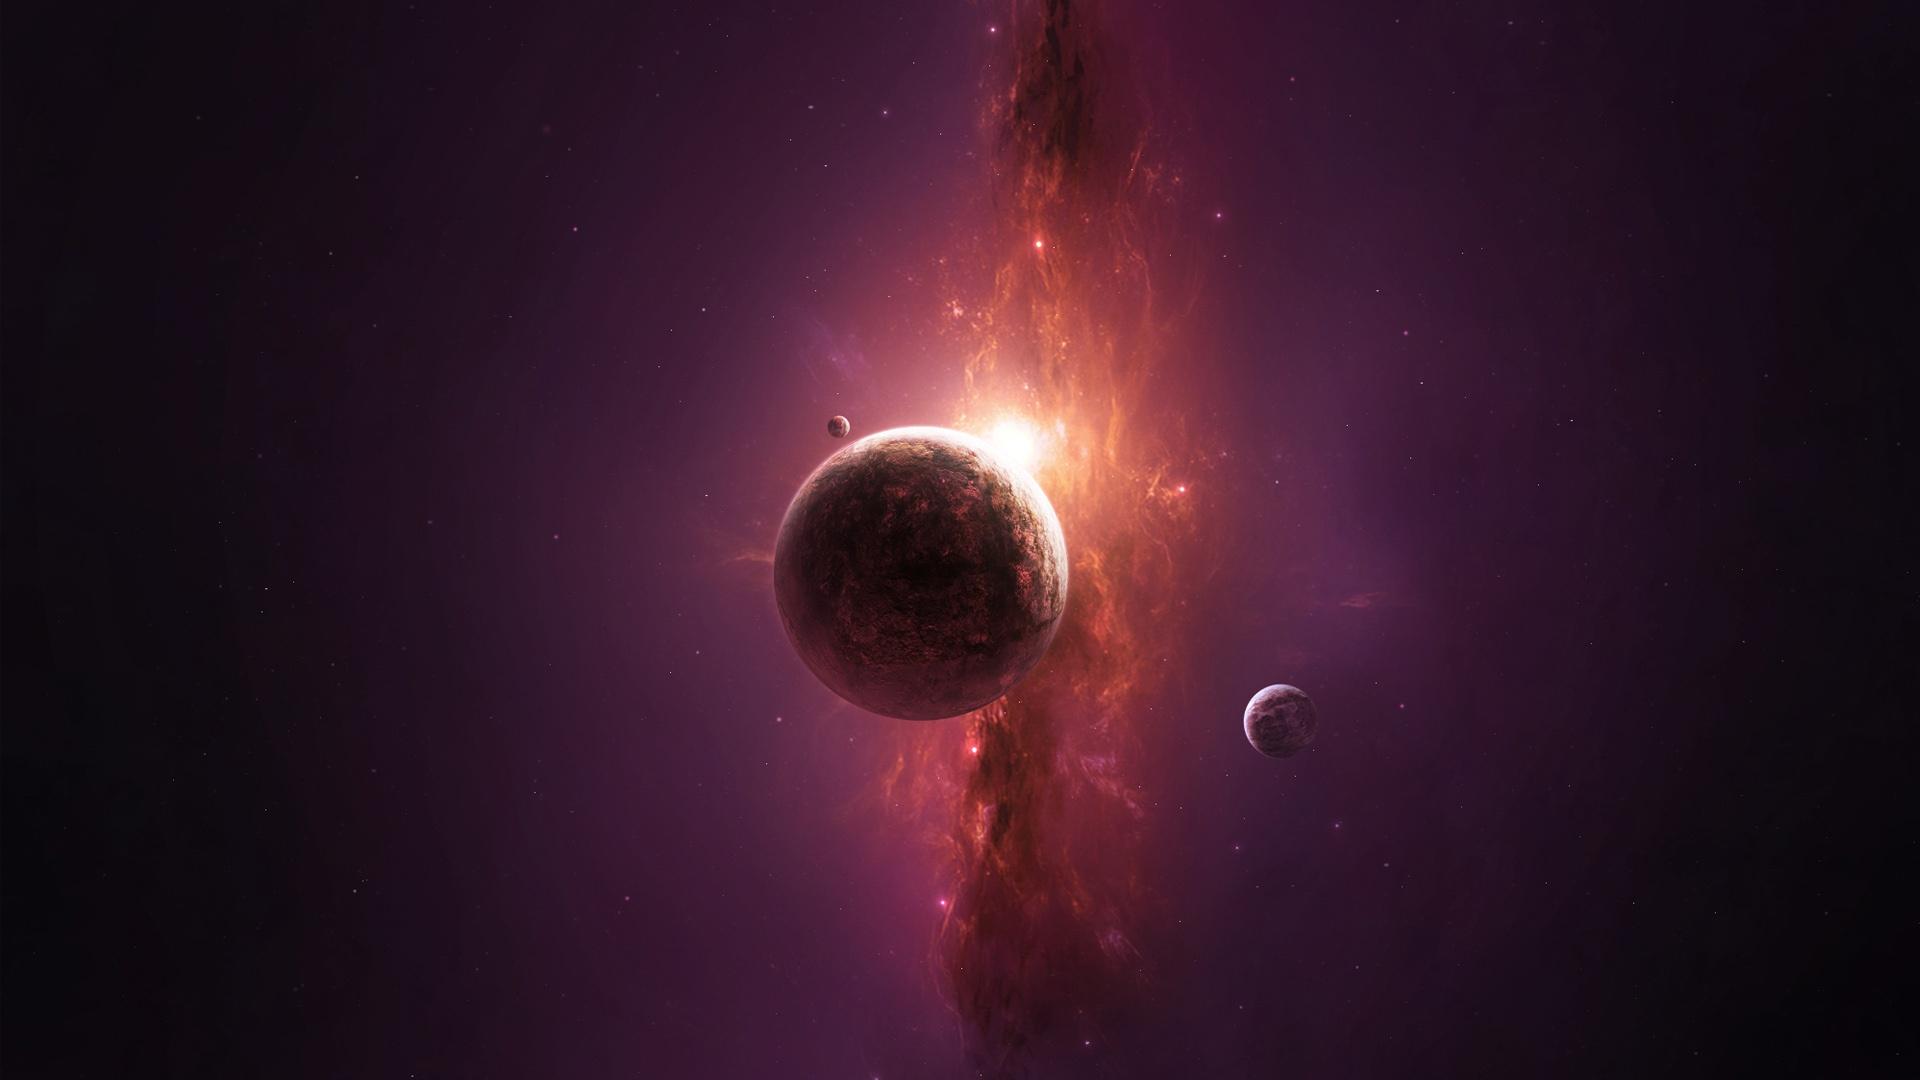 Full HD Wallpaper planet violet nebula moon side view Desktop 1920x1080